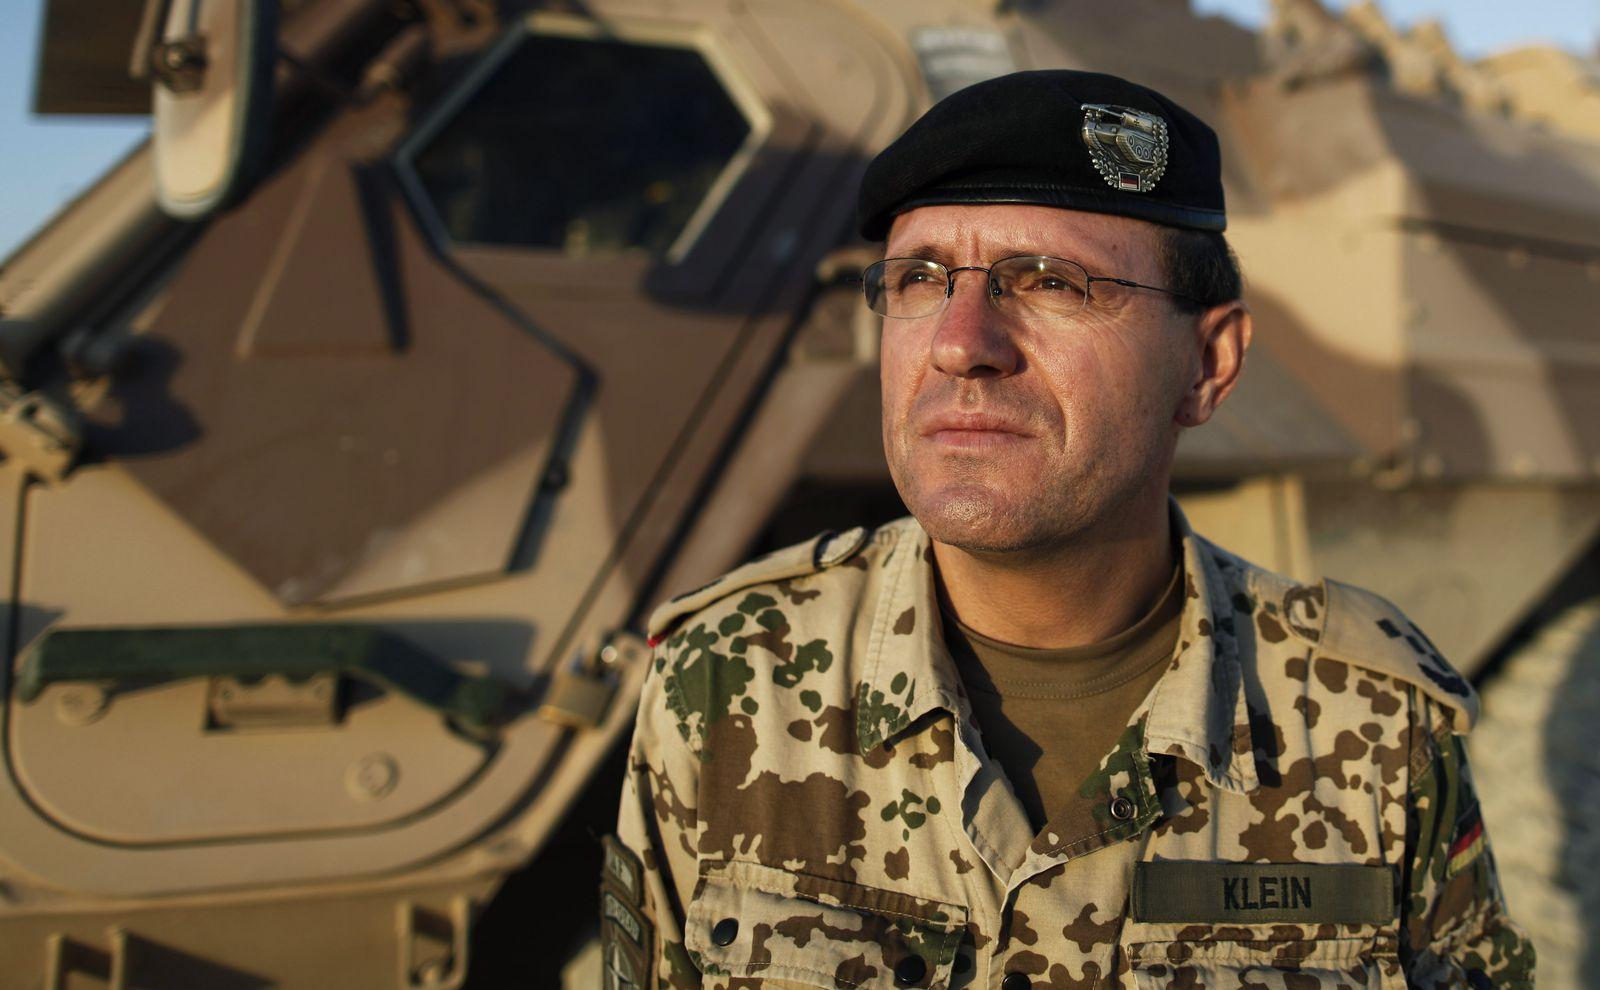 Oberst Georg Klein / Bundeswehr / Afghanistan